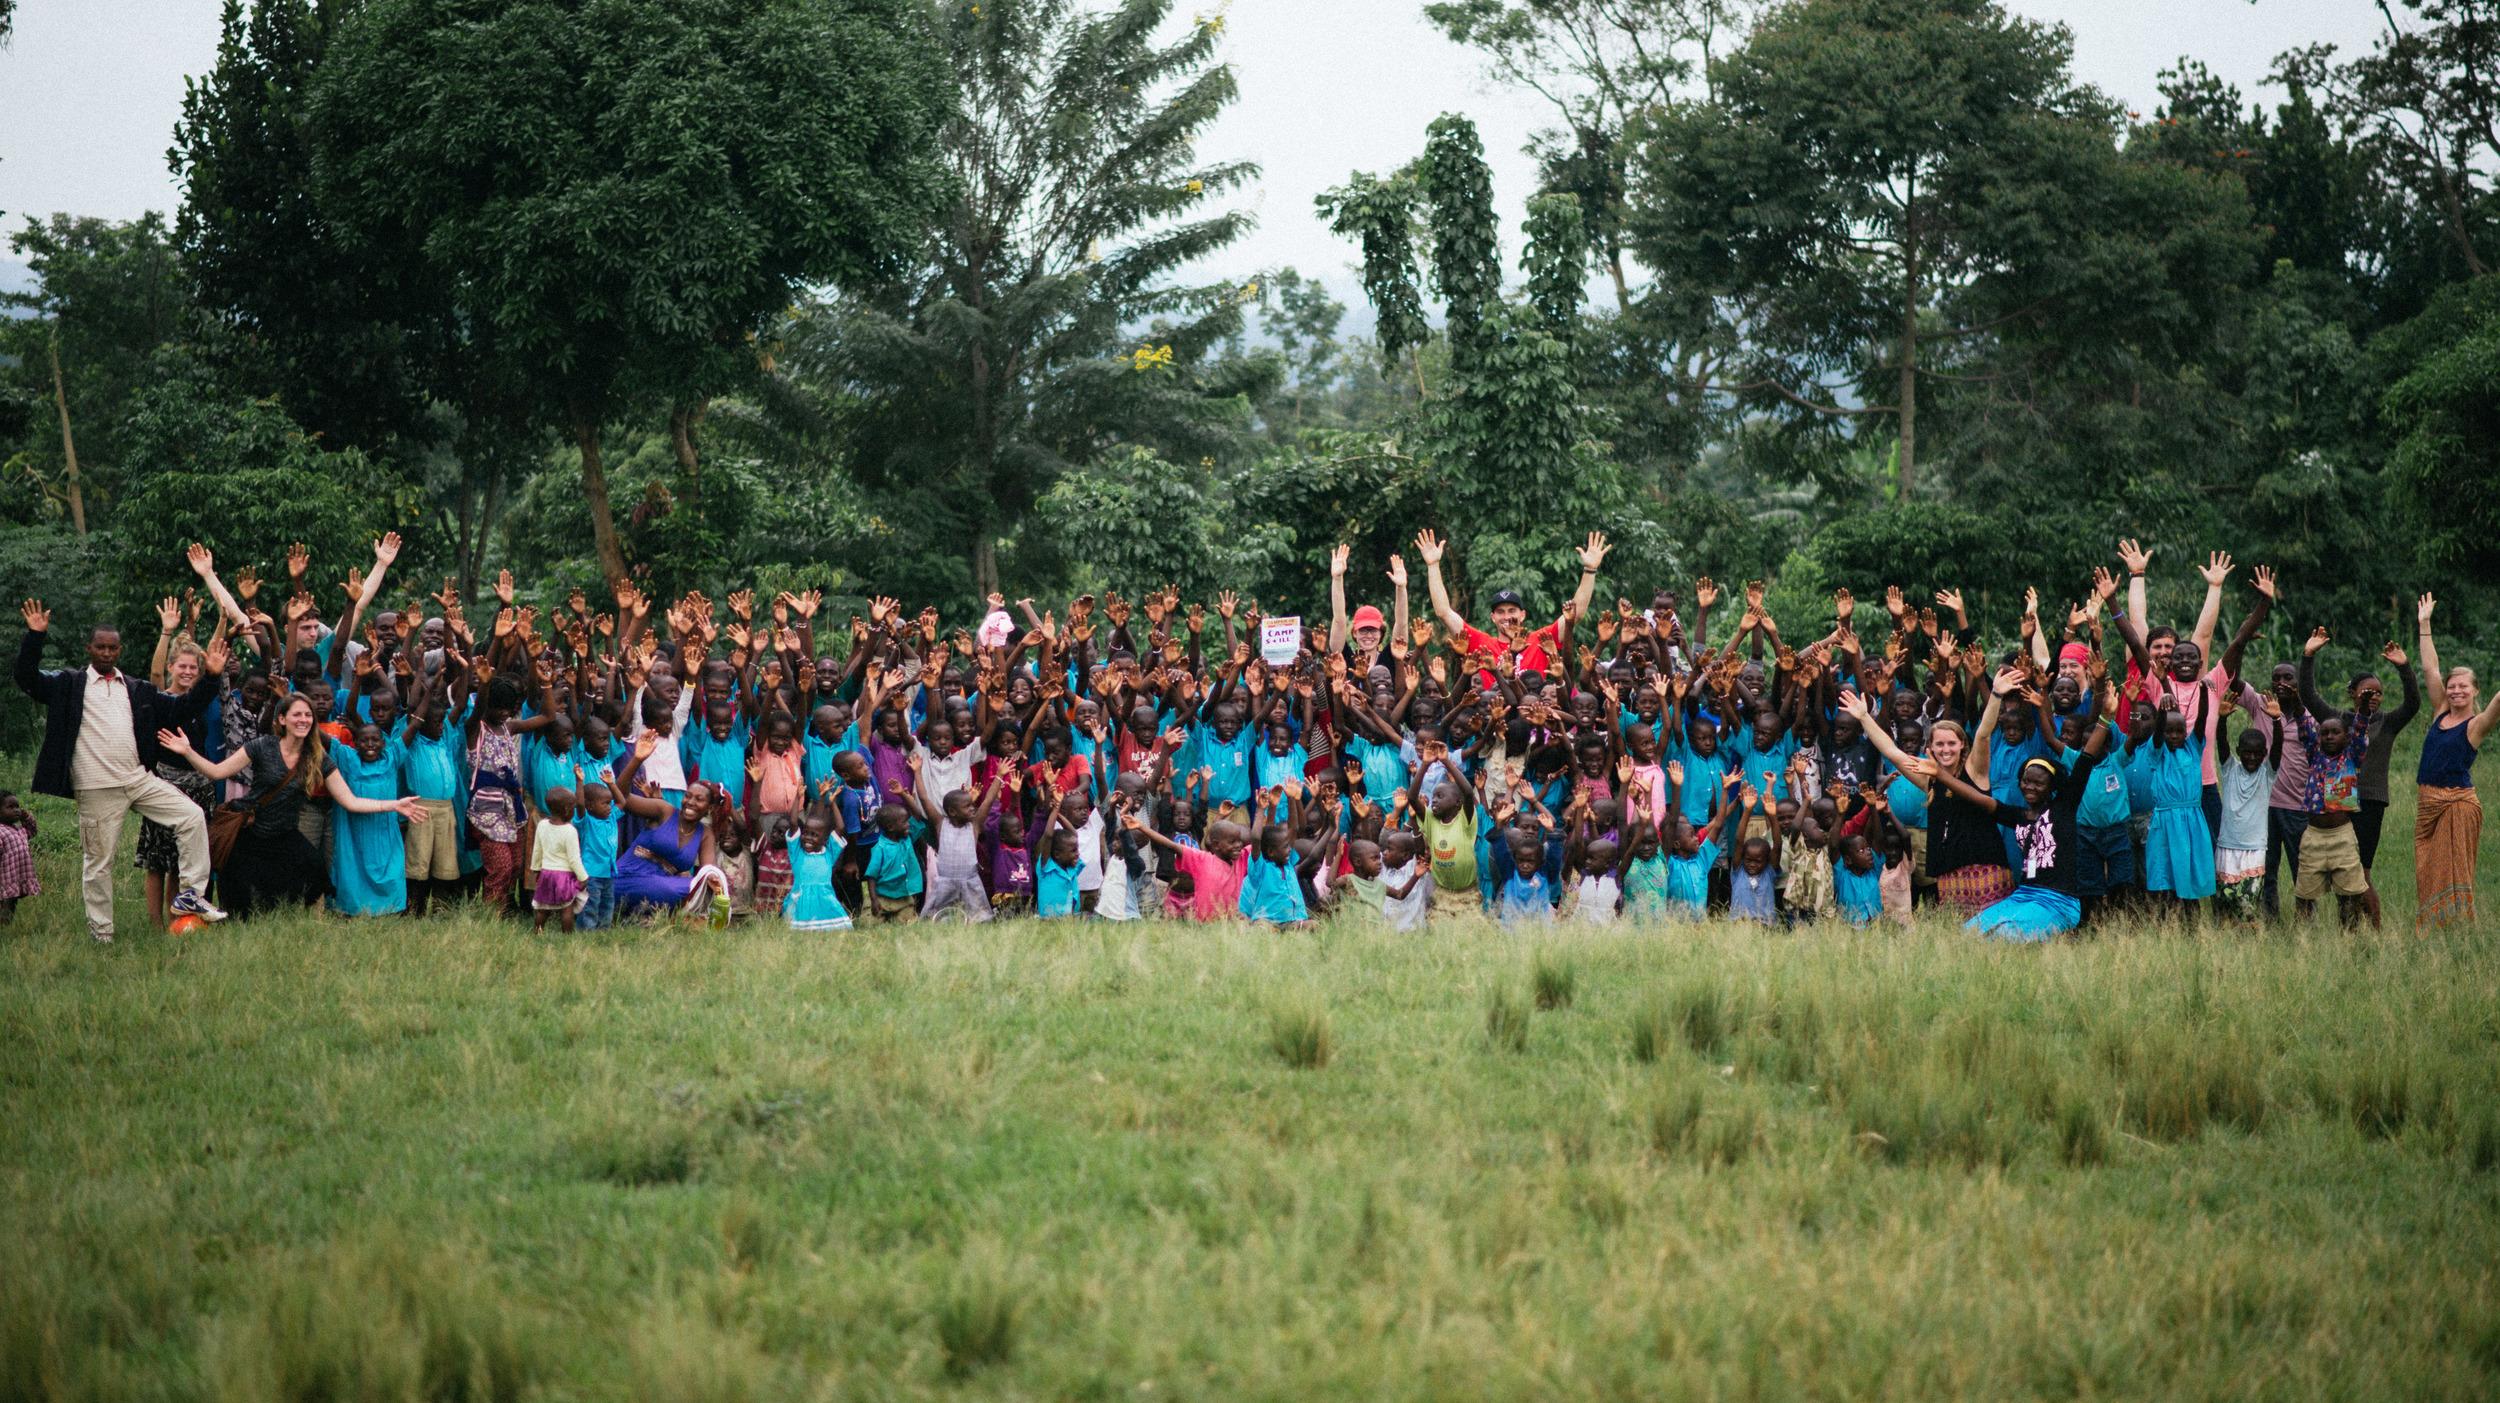 A group photo of Camp Skillz: Uganda 2016! What a wonderful week for everyone involved.